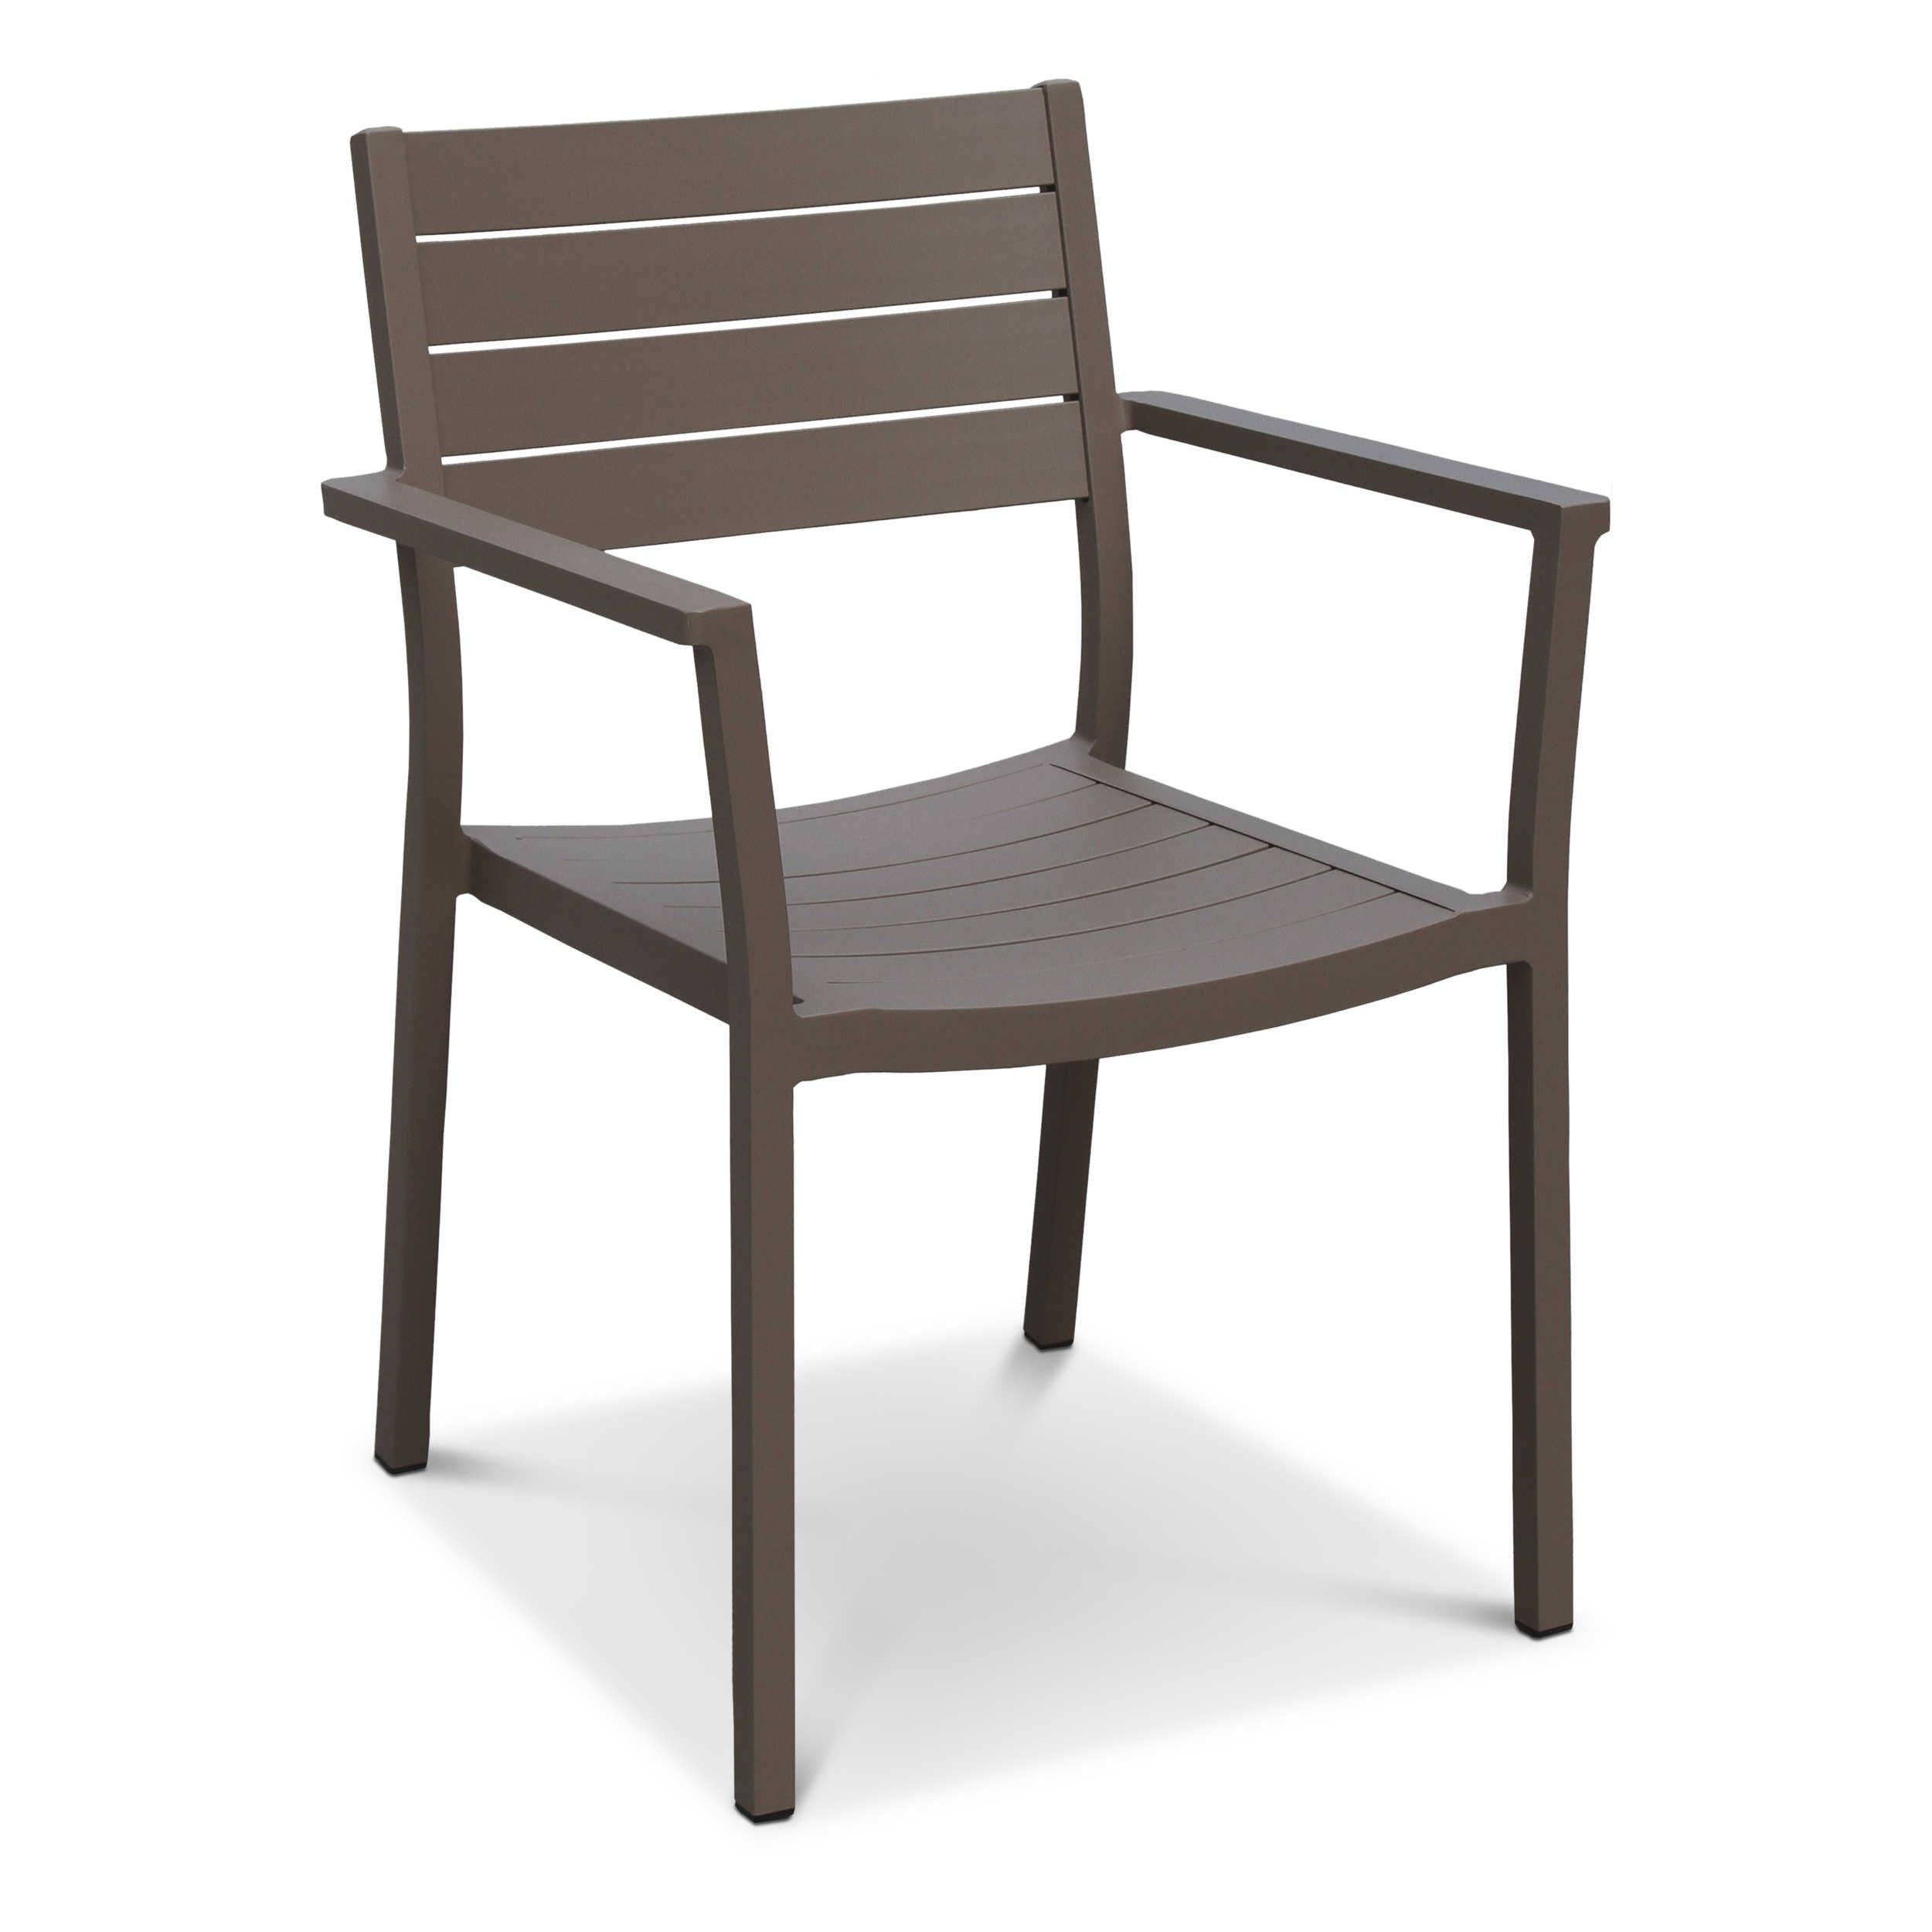 stapelstuhl amica aluminium defactodeal. Black Bedroom Furniture Sets. Home Design Ideas